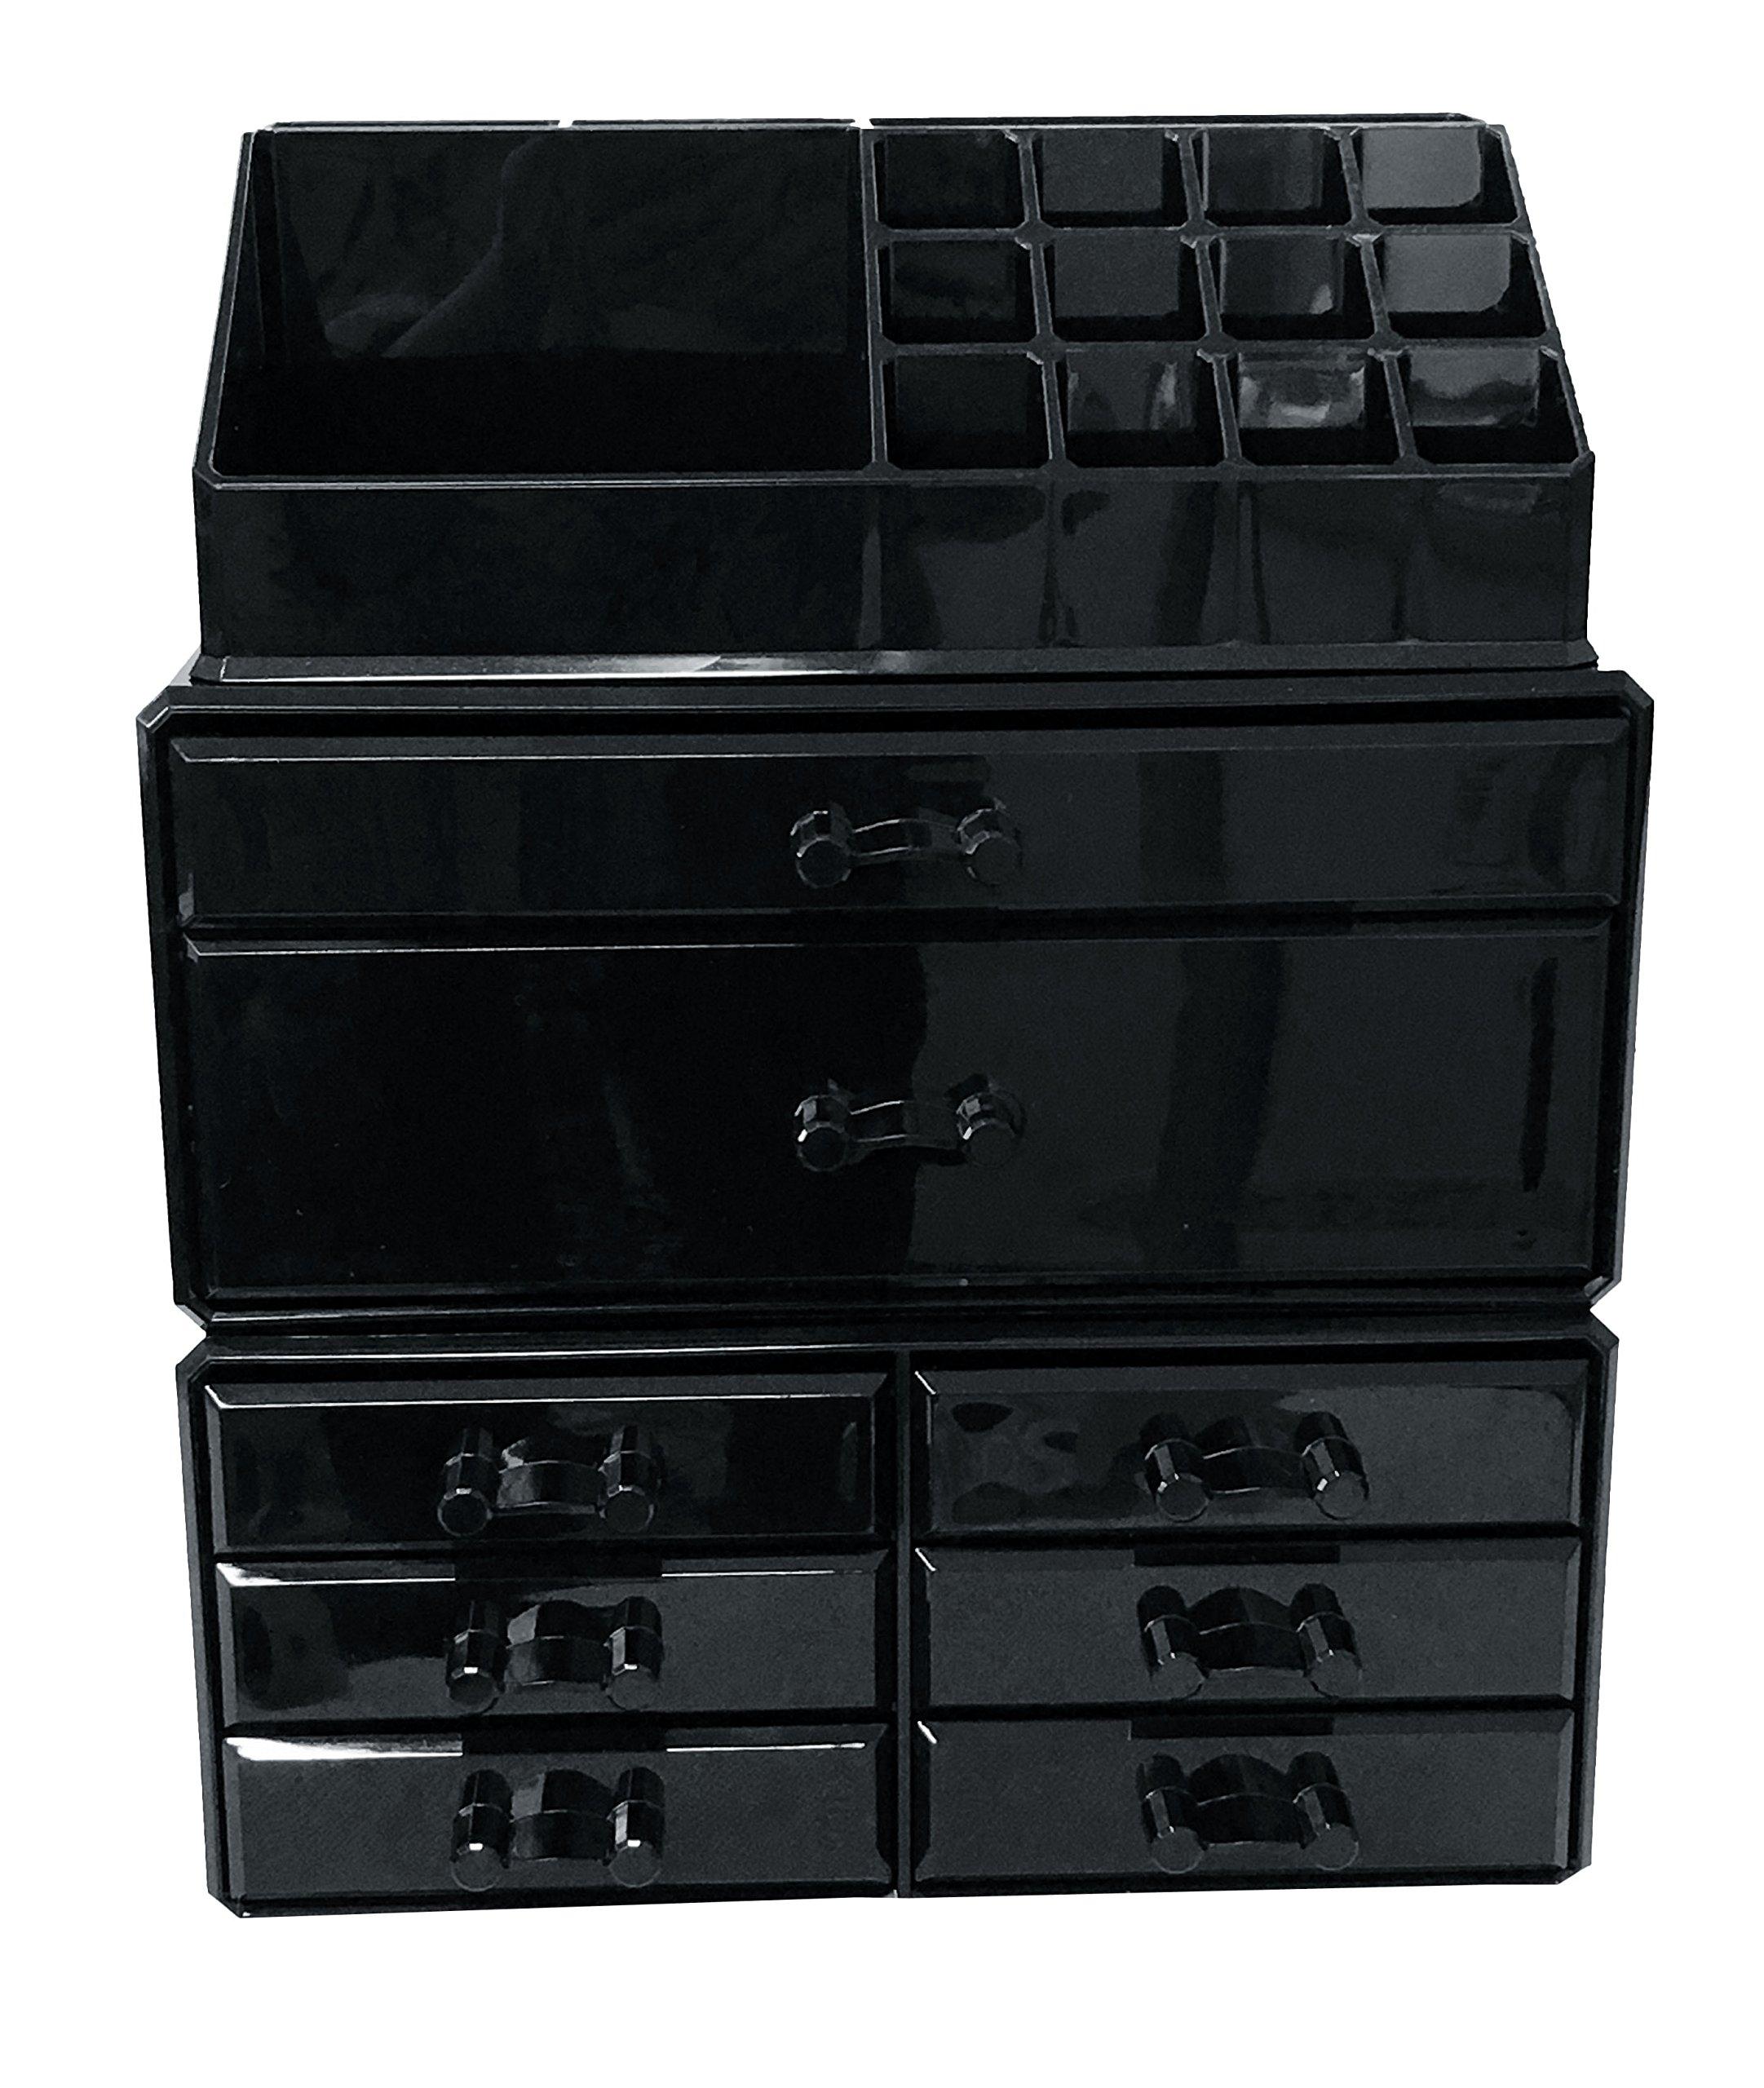 black acrylic makeup organizer drawers box make up cosmetic display storage case ebay. Black Bedroom Furniture Sets. Home Design Ideas